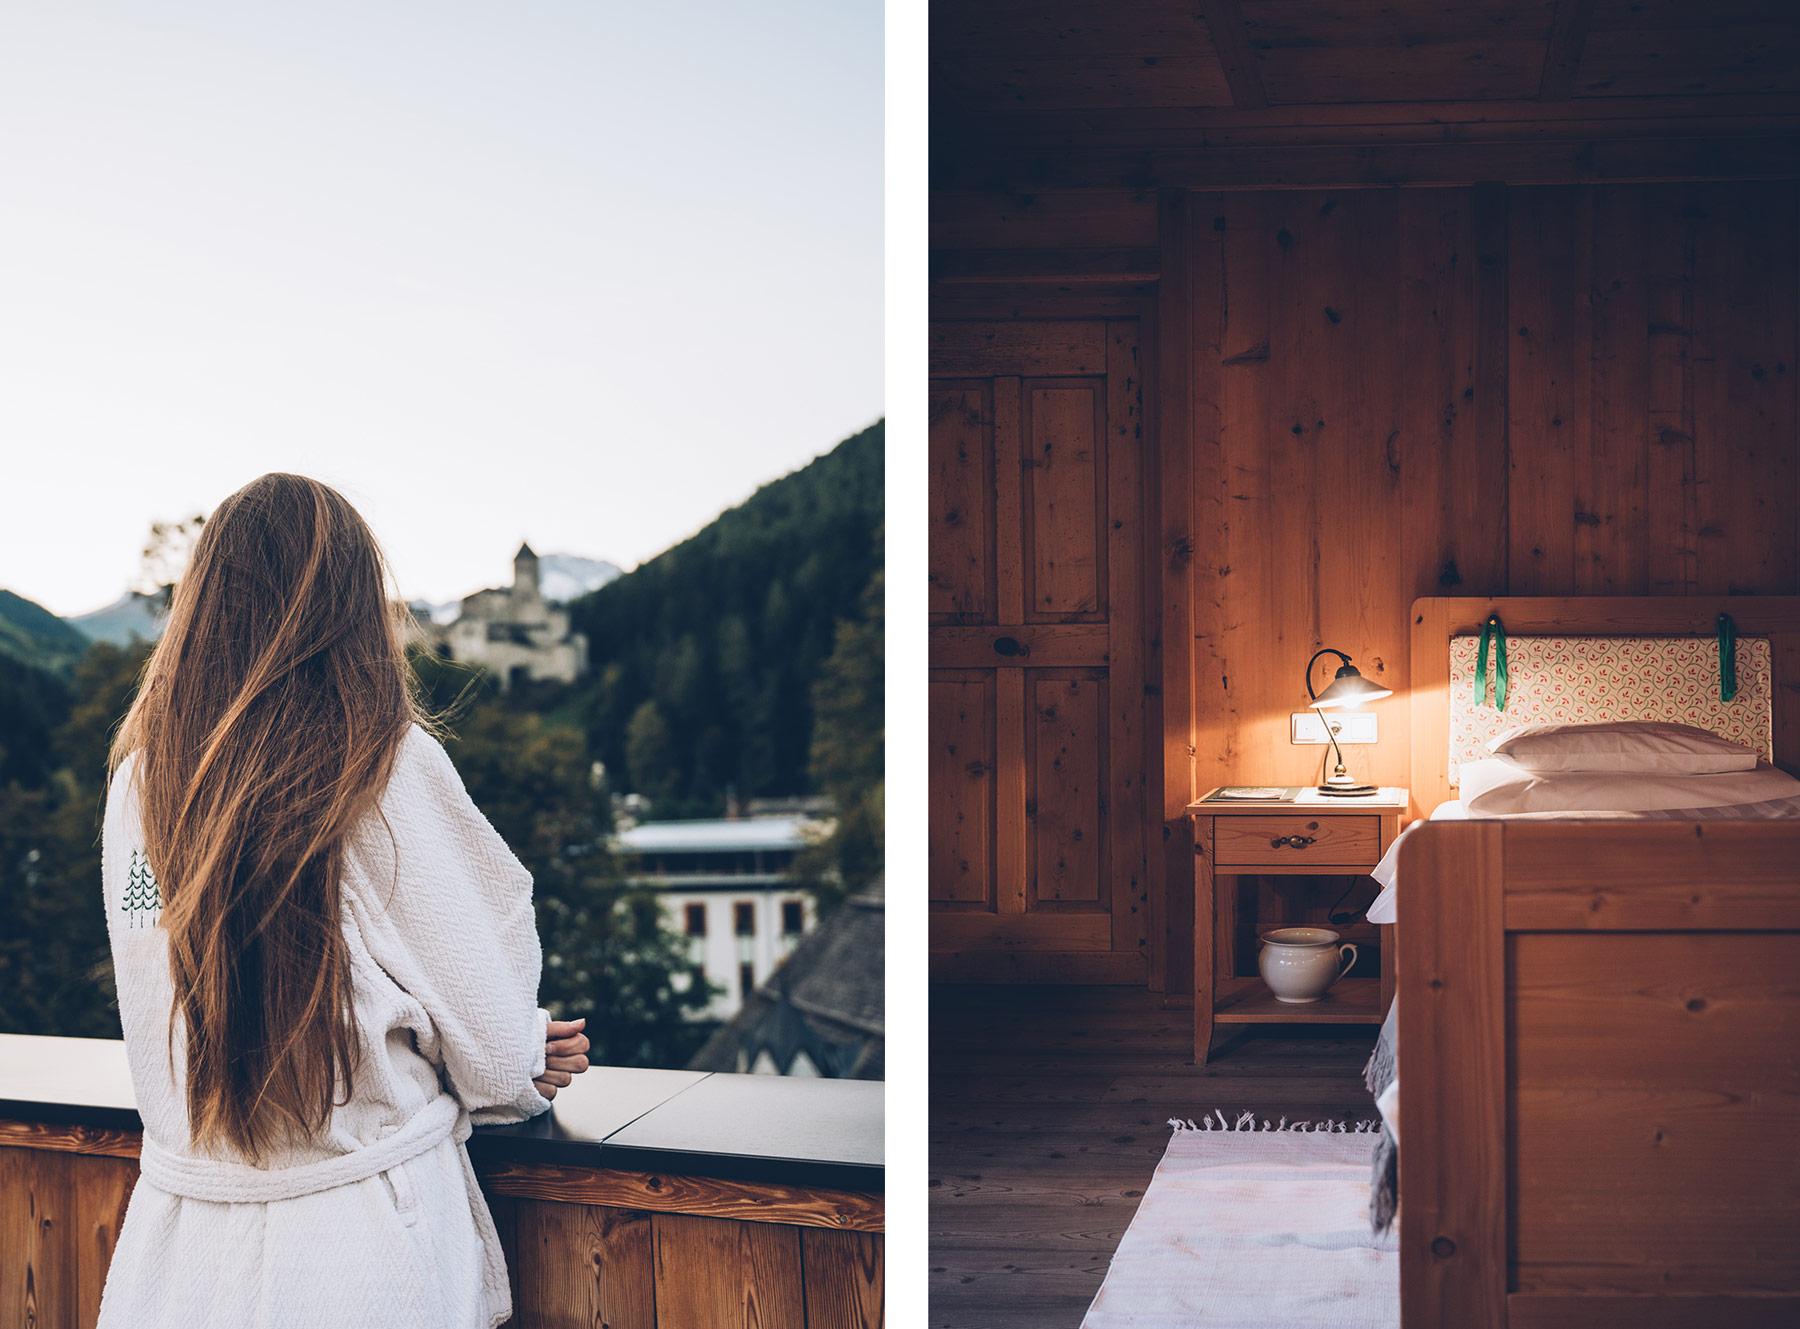 Drumlerhof Hotel, Dolomites